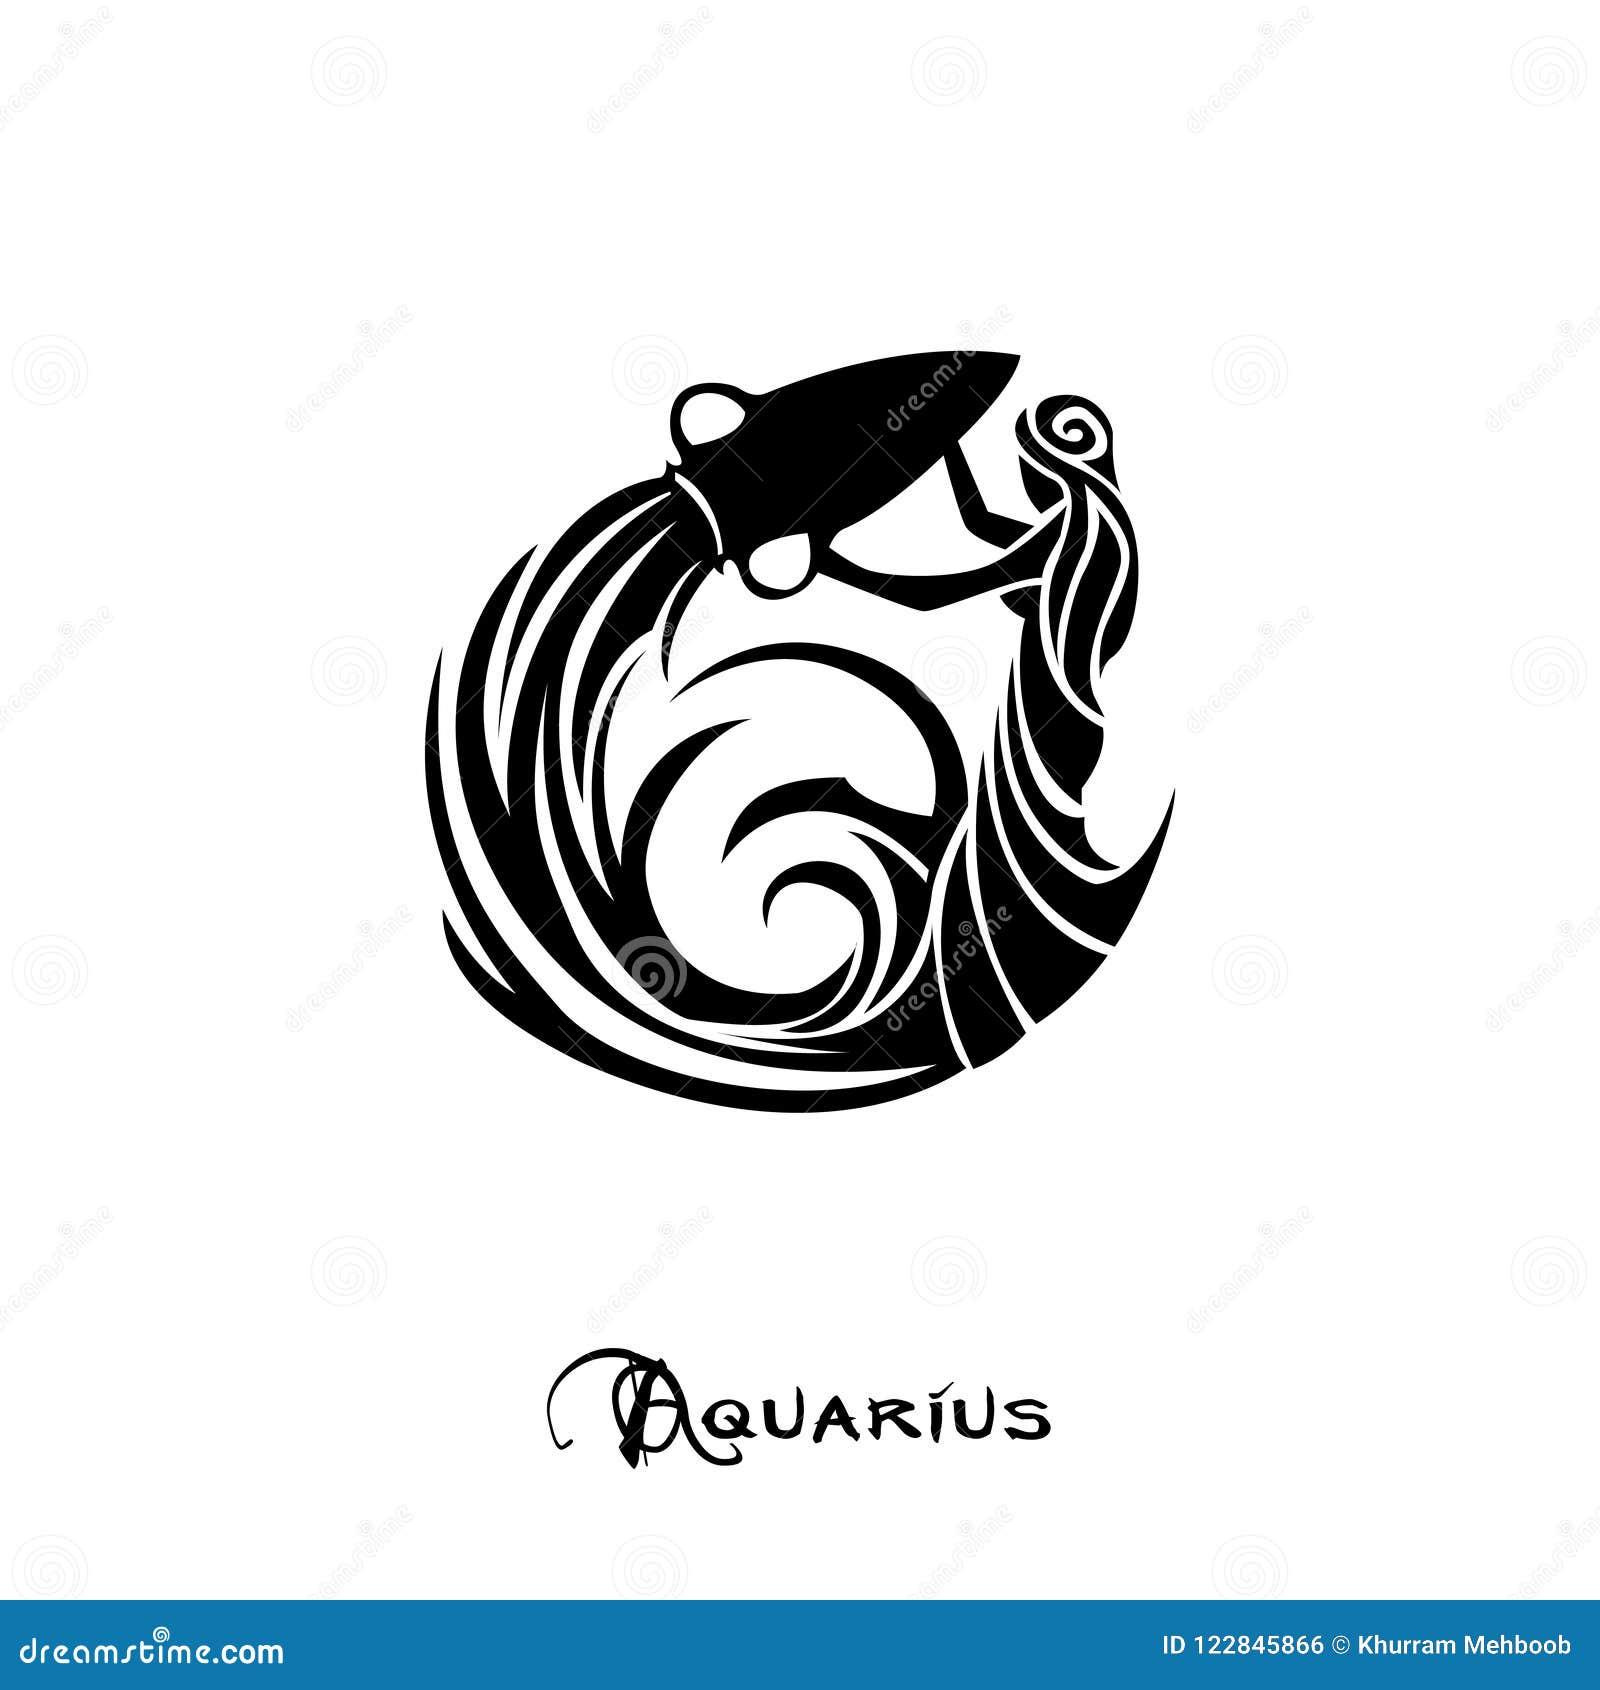 Aquarius Zodiac Sign Tattoo Style Stock Illustration